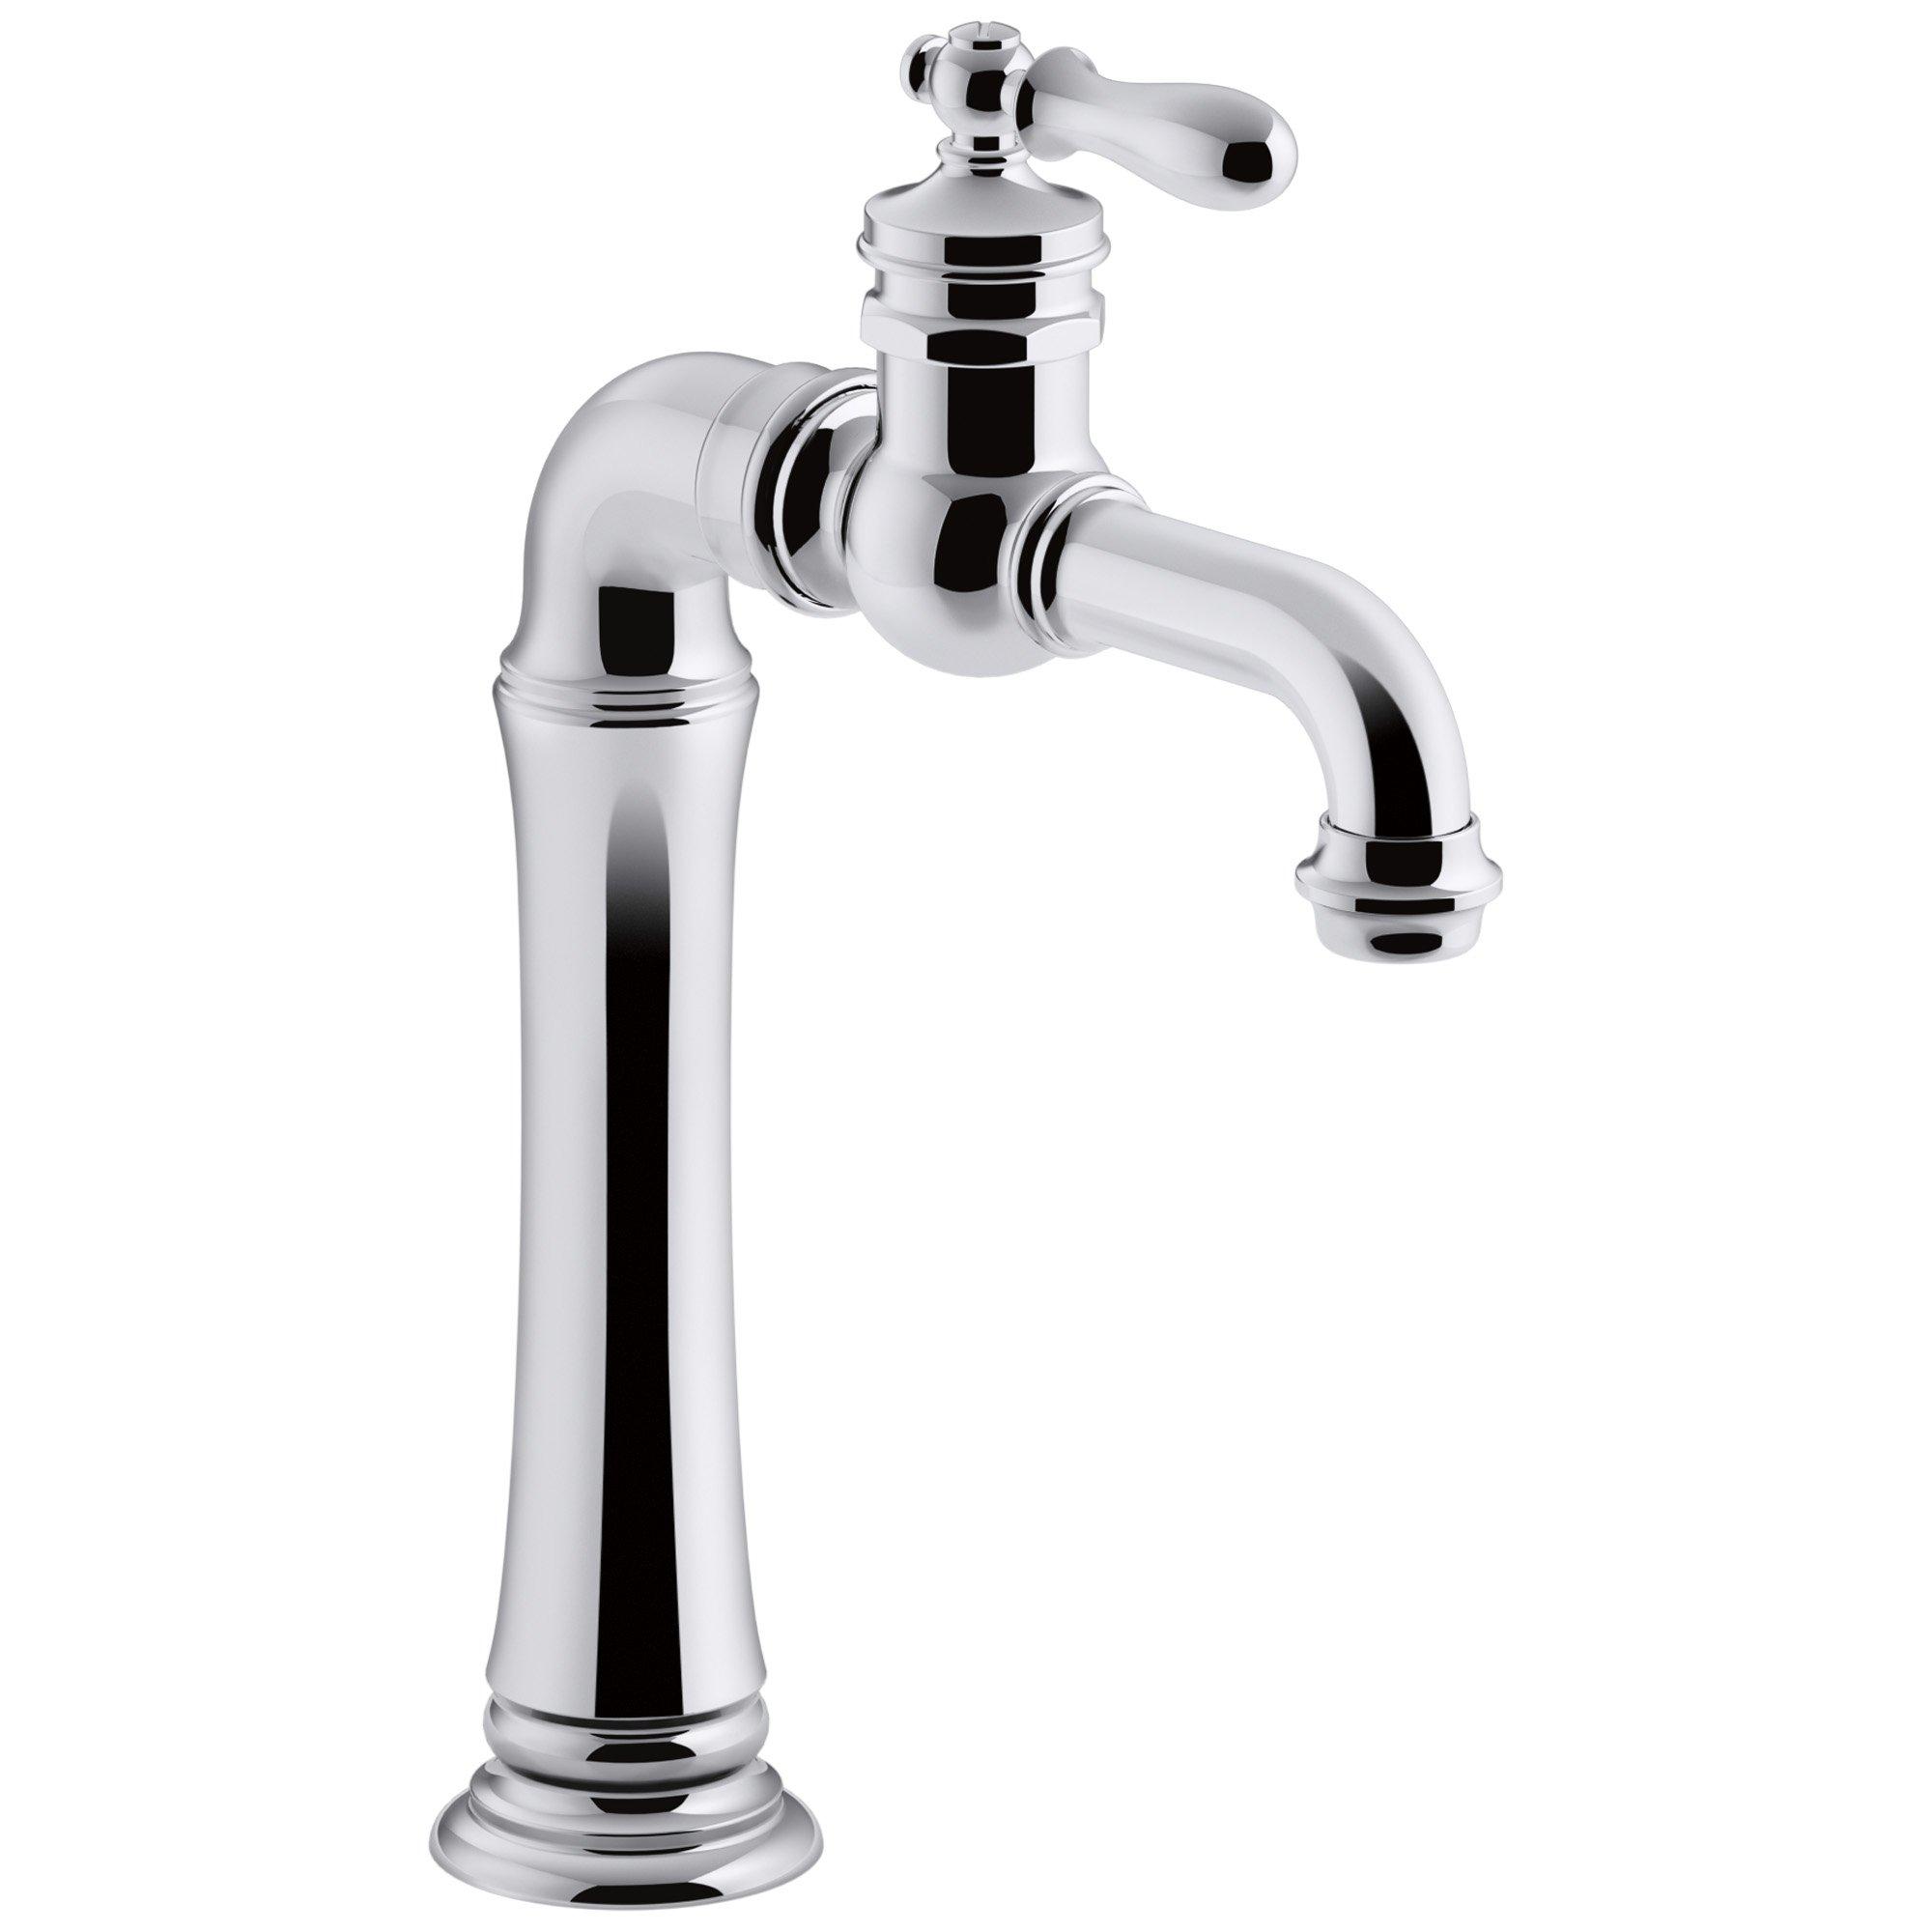 KOHLER K-99268-CP Artifacts Gentleman's Bar Sink Faucet, Polished Chrome, Single Handle, Prep Faucet, Secondary Faucet, Single Hole Installation, Entertainment Faucet by Kohler